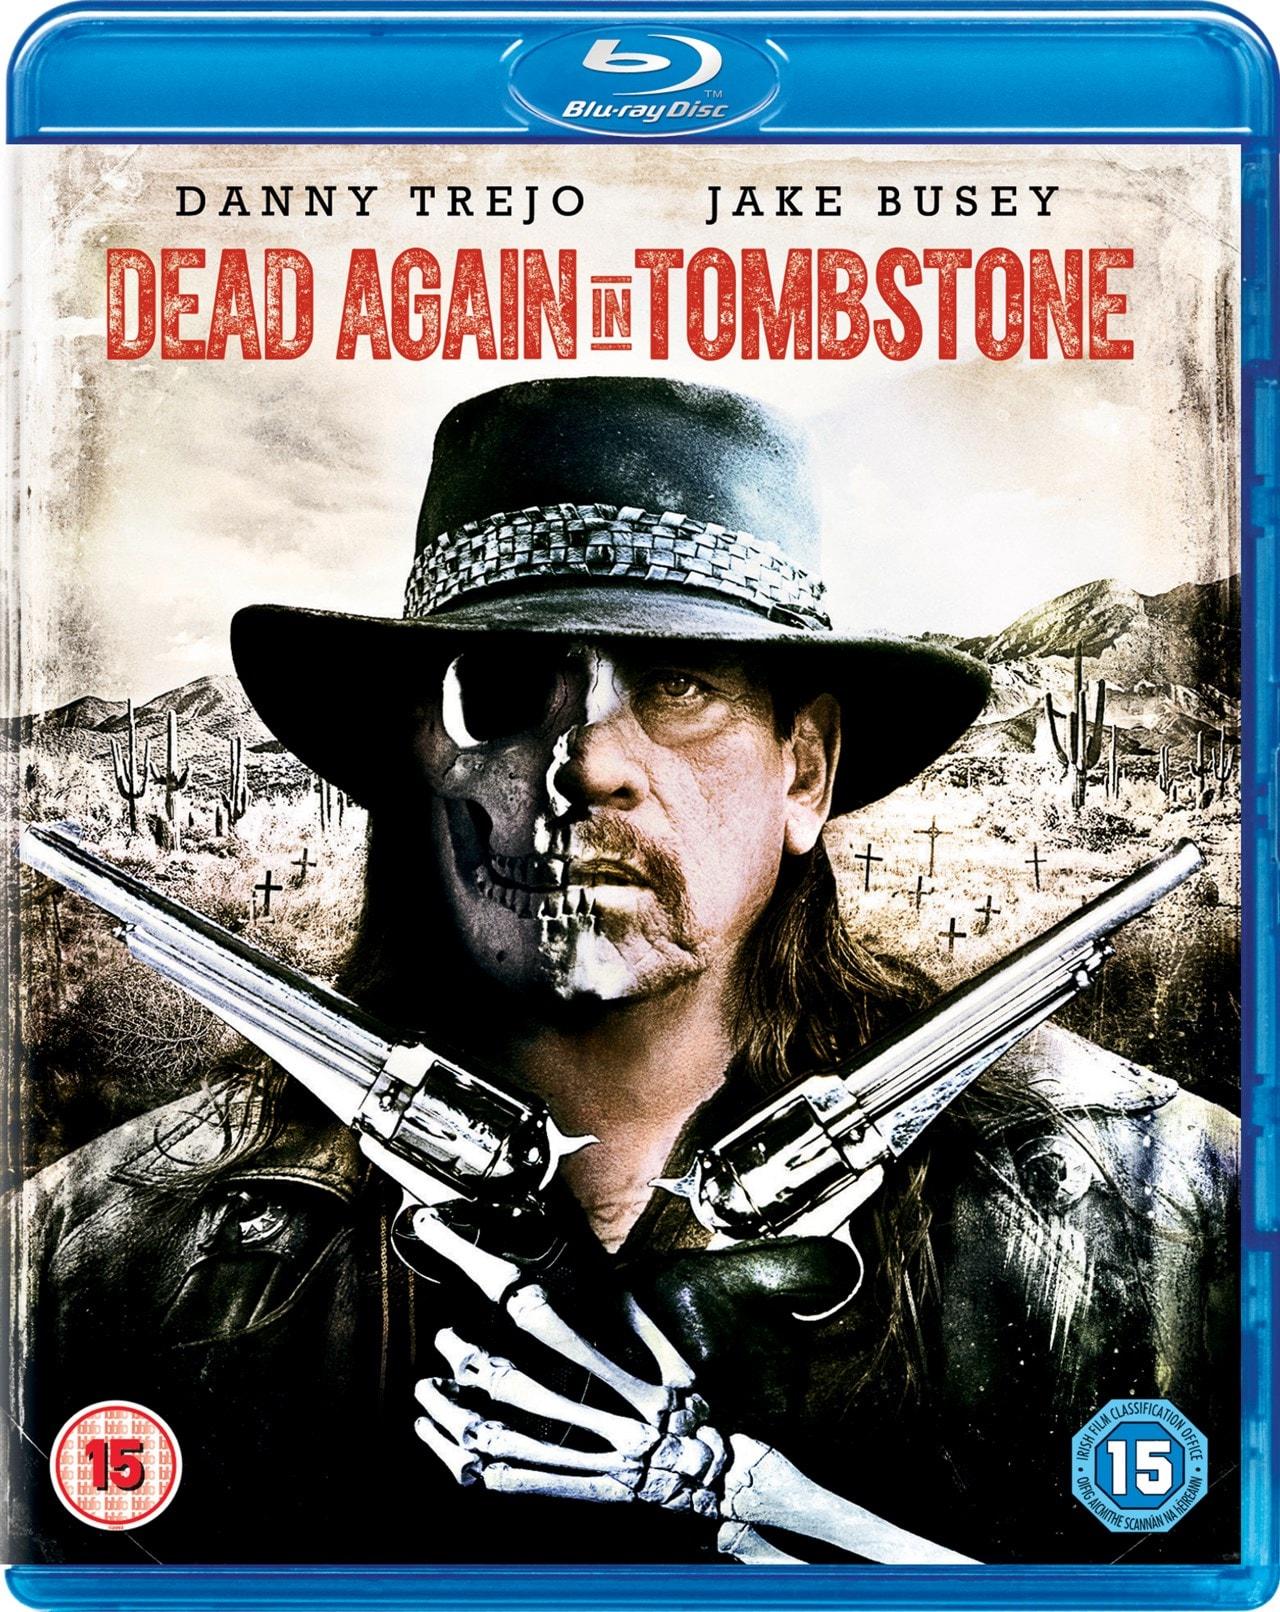 Dead Again in Tombstone - 1